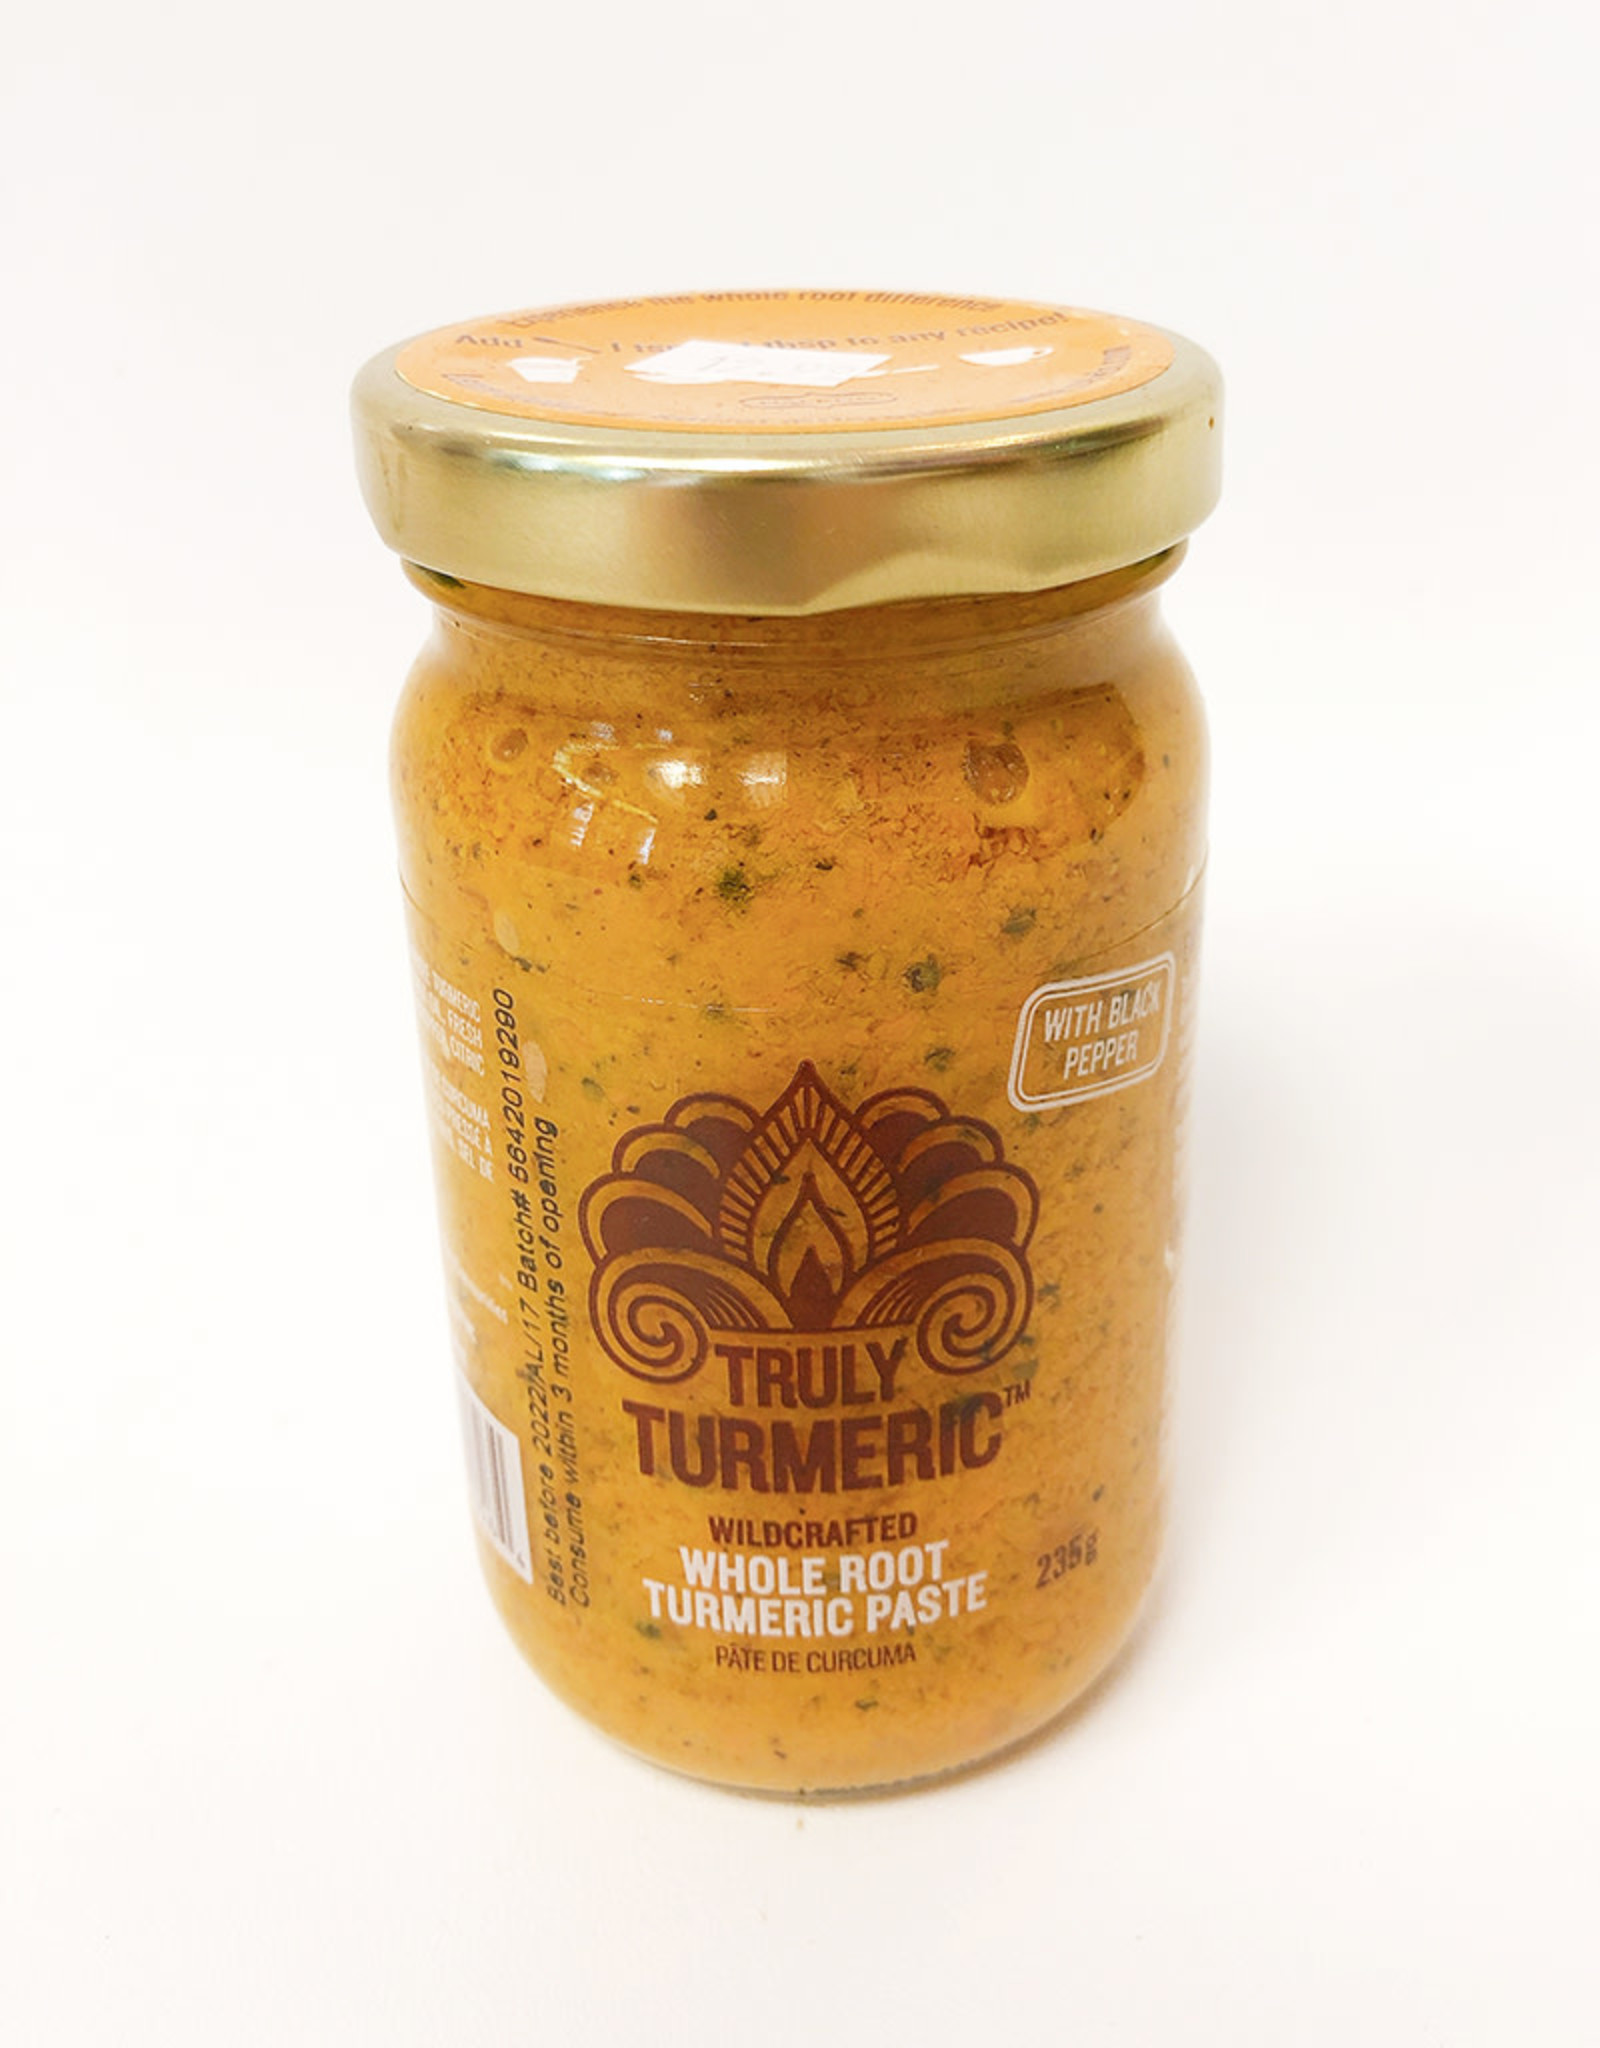 Truly Turmeric Truly Turmeric - Paste, Black Pepper (235g)